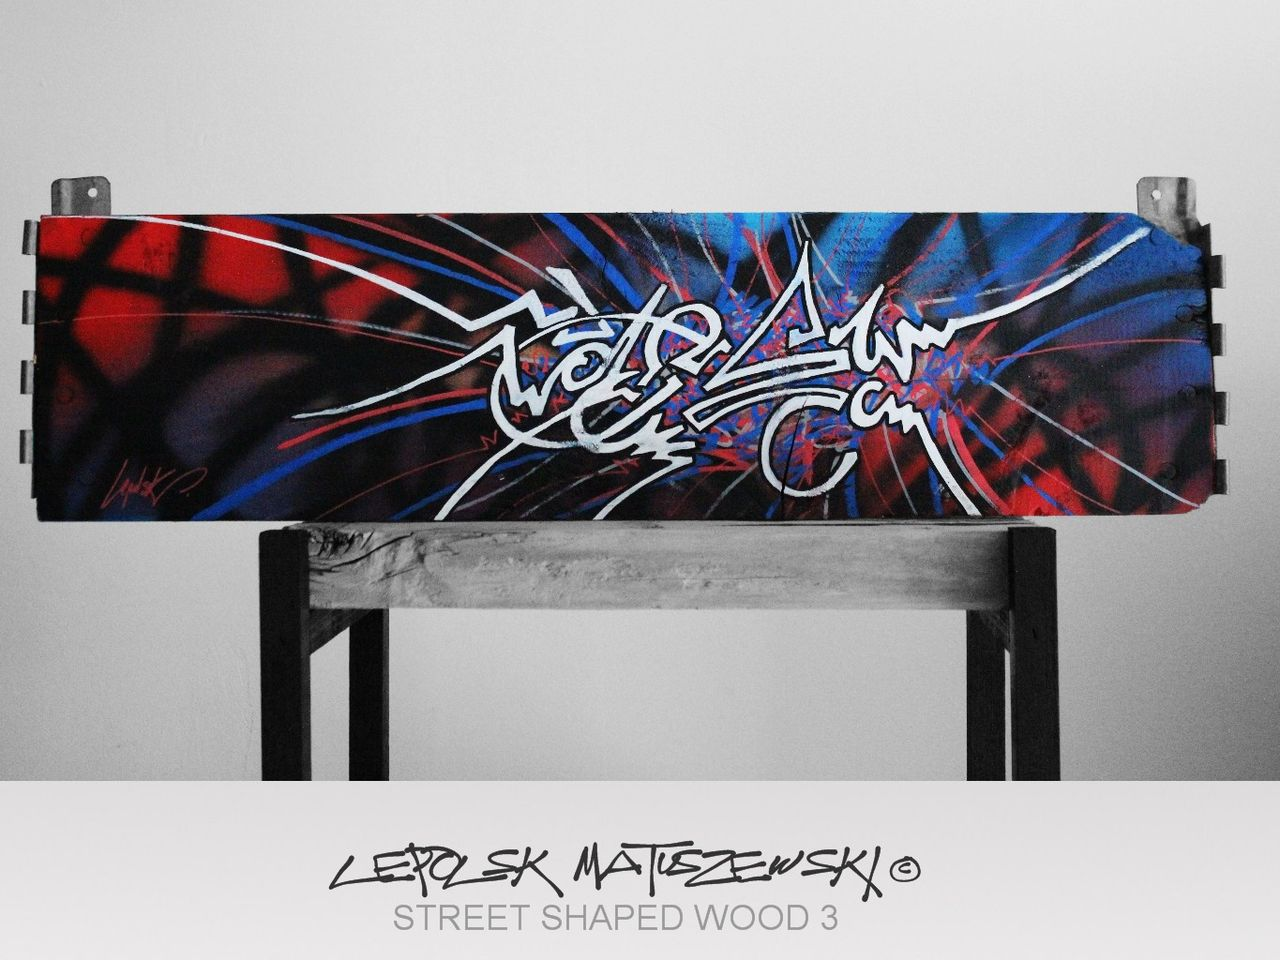 MK  Lepolsk Matuszewski STREET SHAPED WOOD 3   street art calligraffiti graffiti abstrait